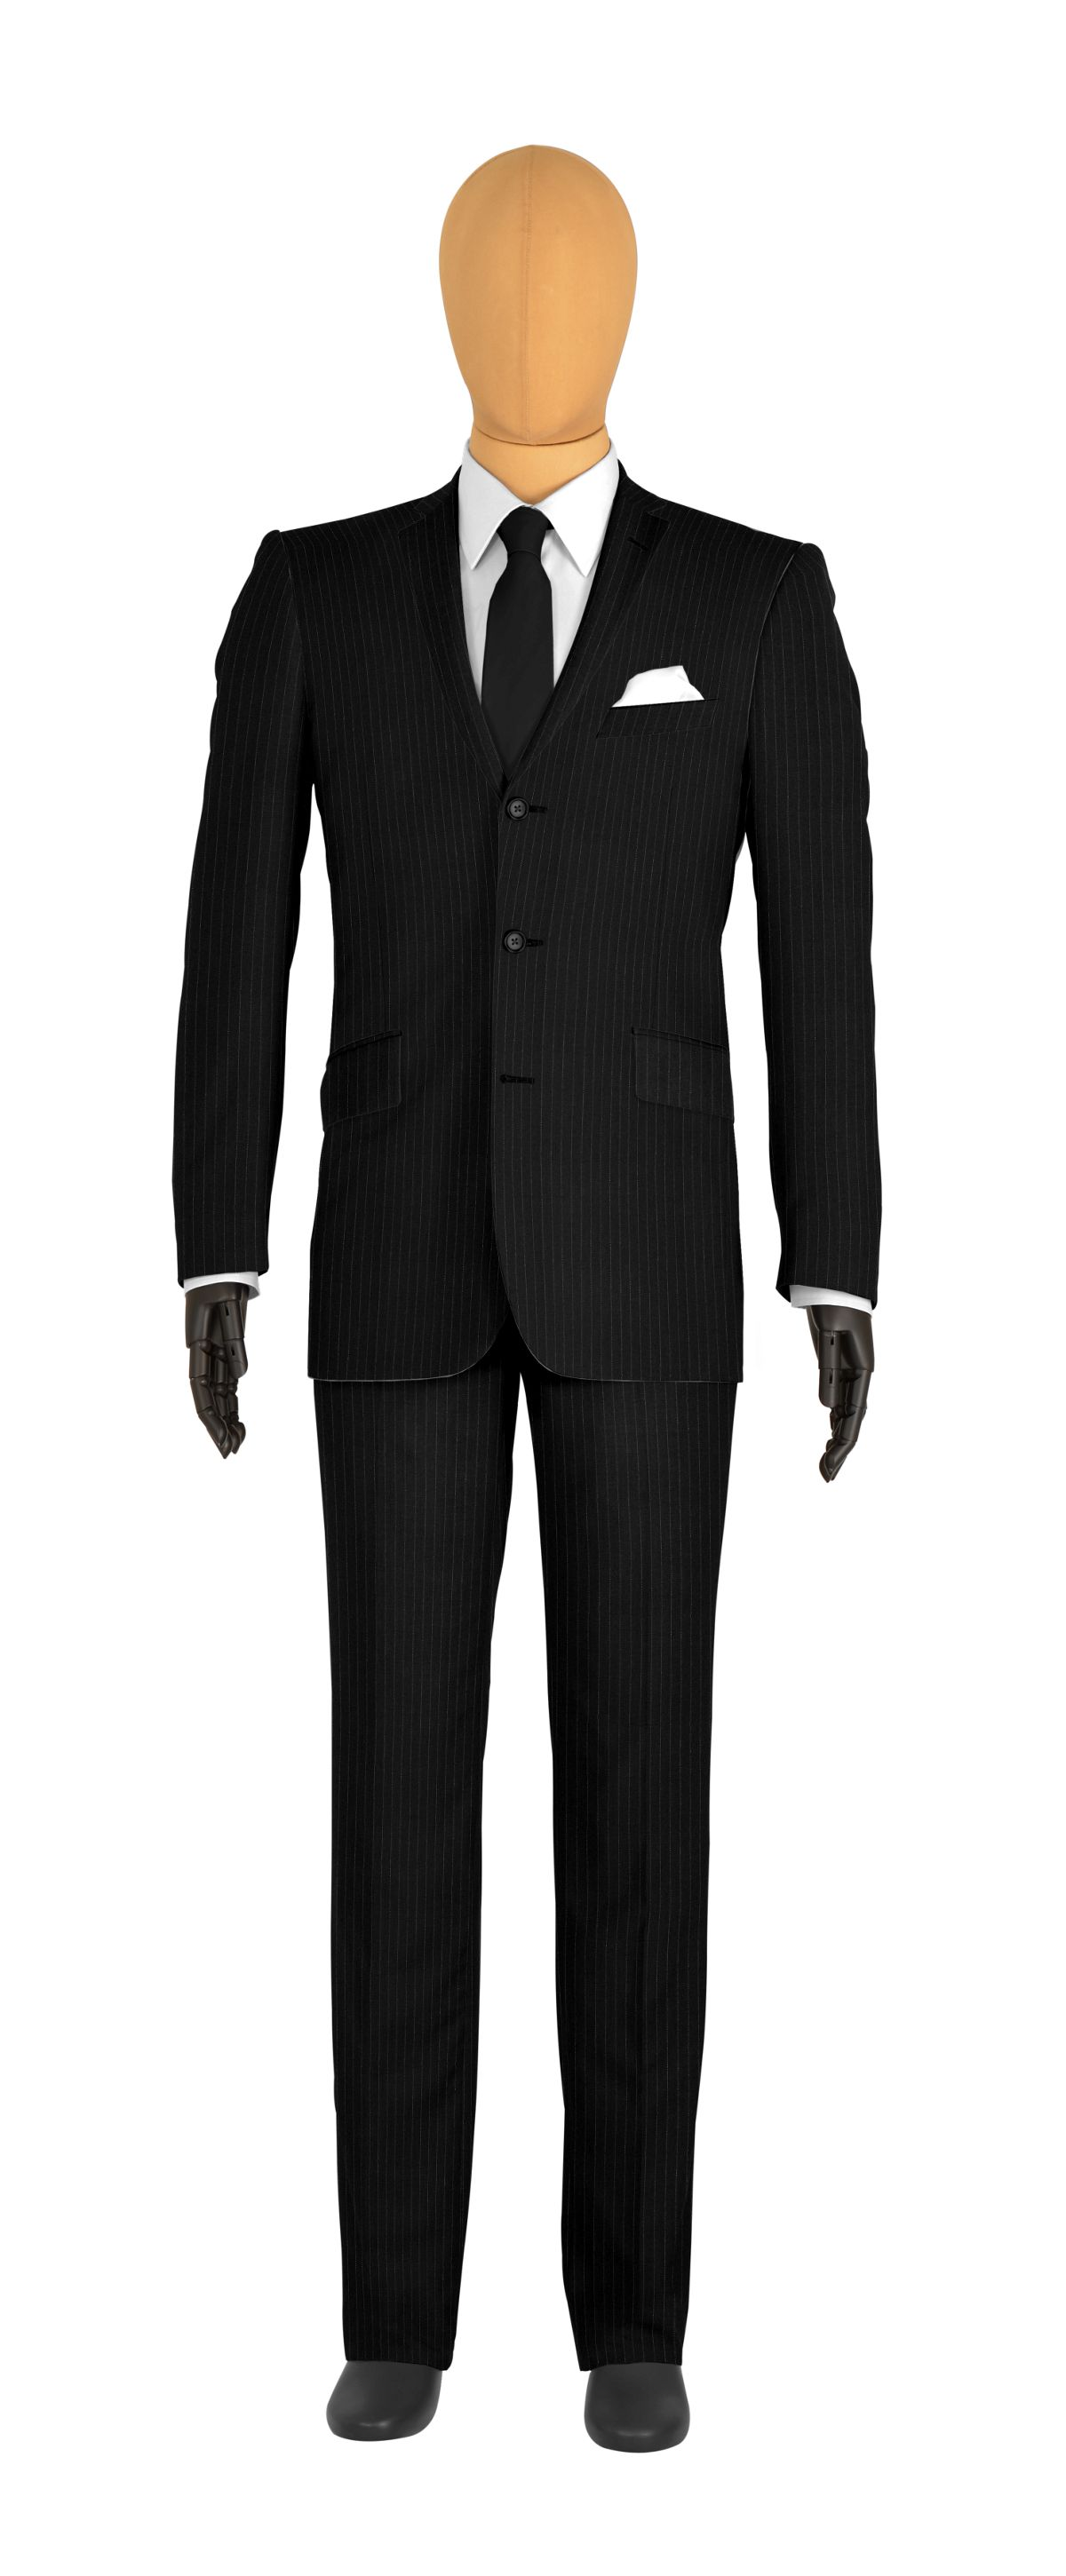 Costume 3 boutons noir rayé